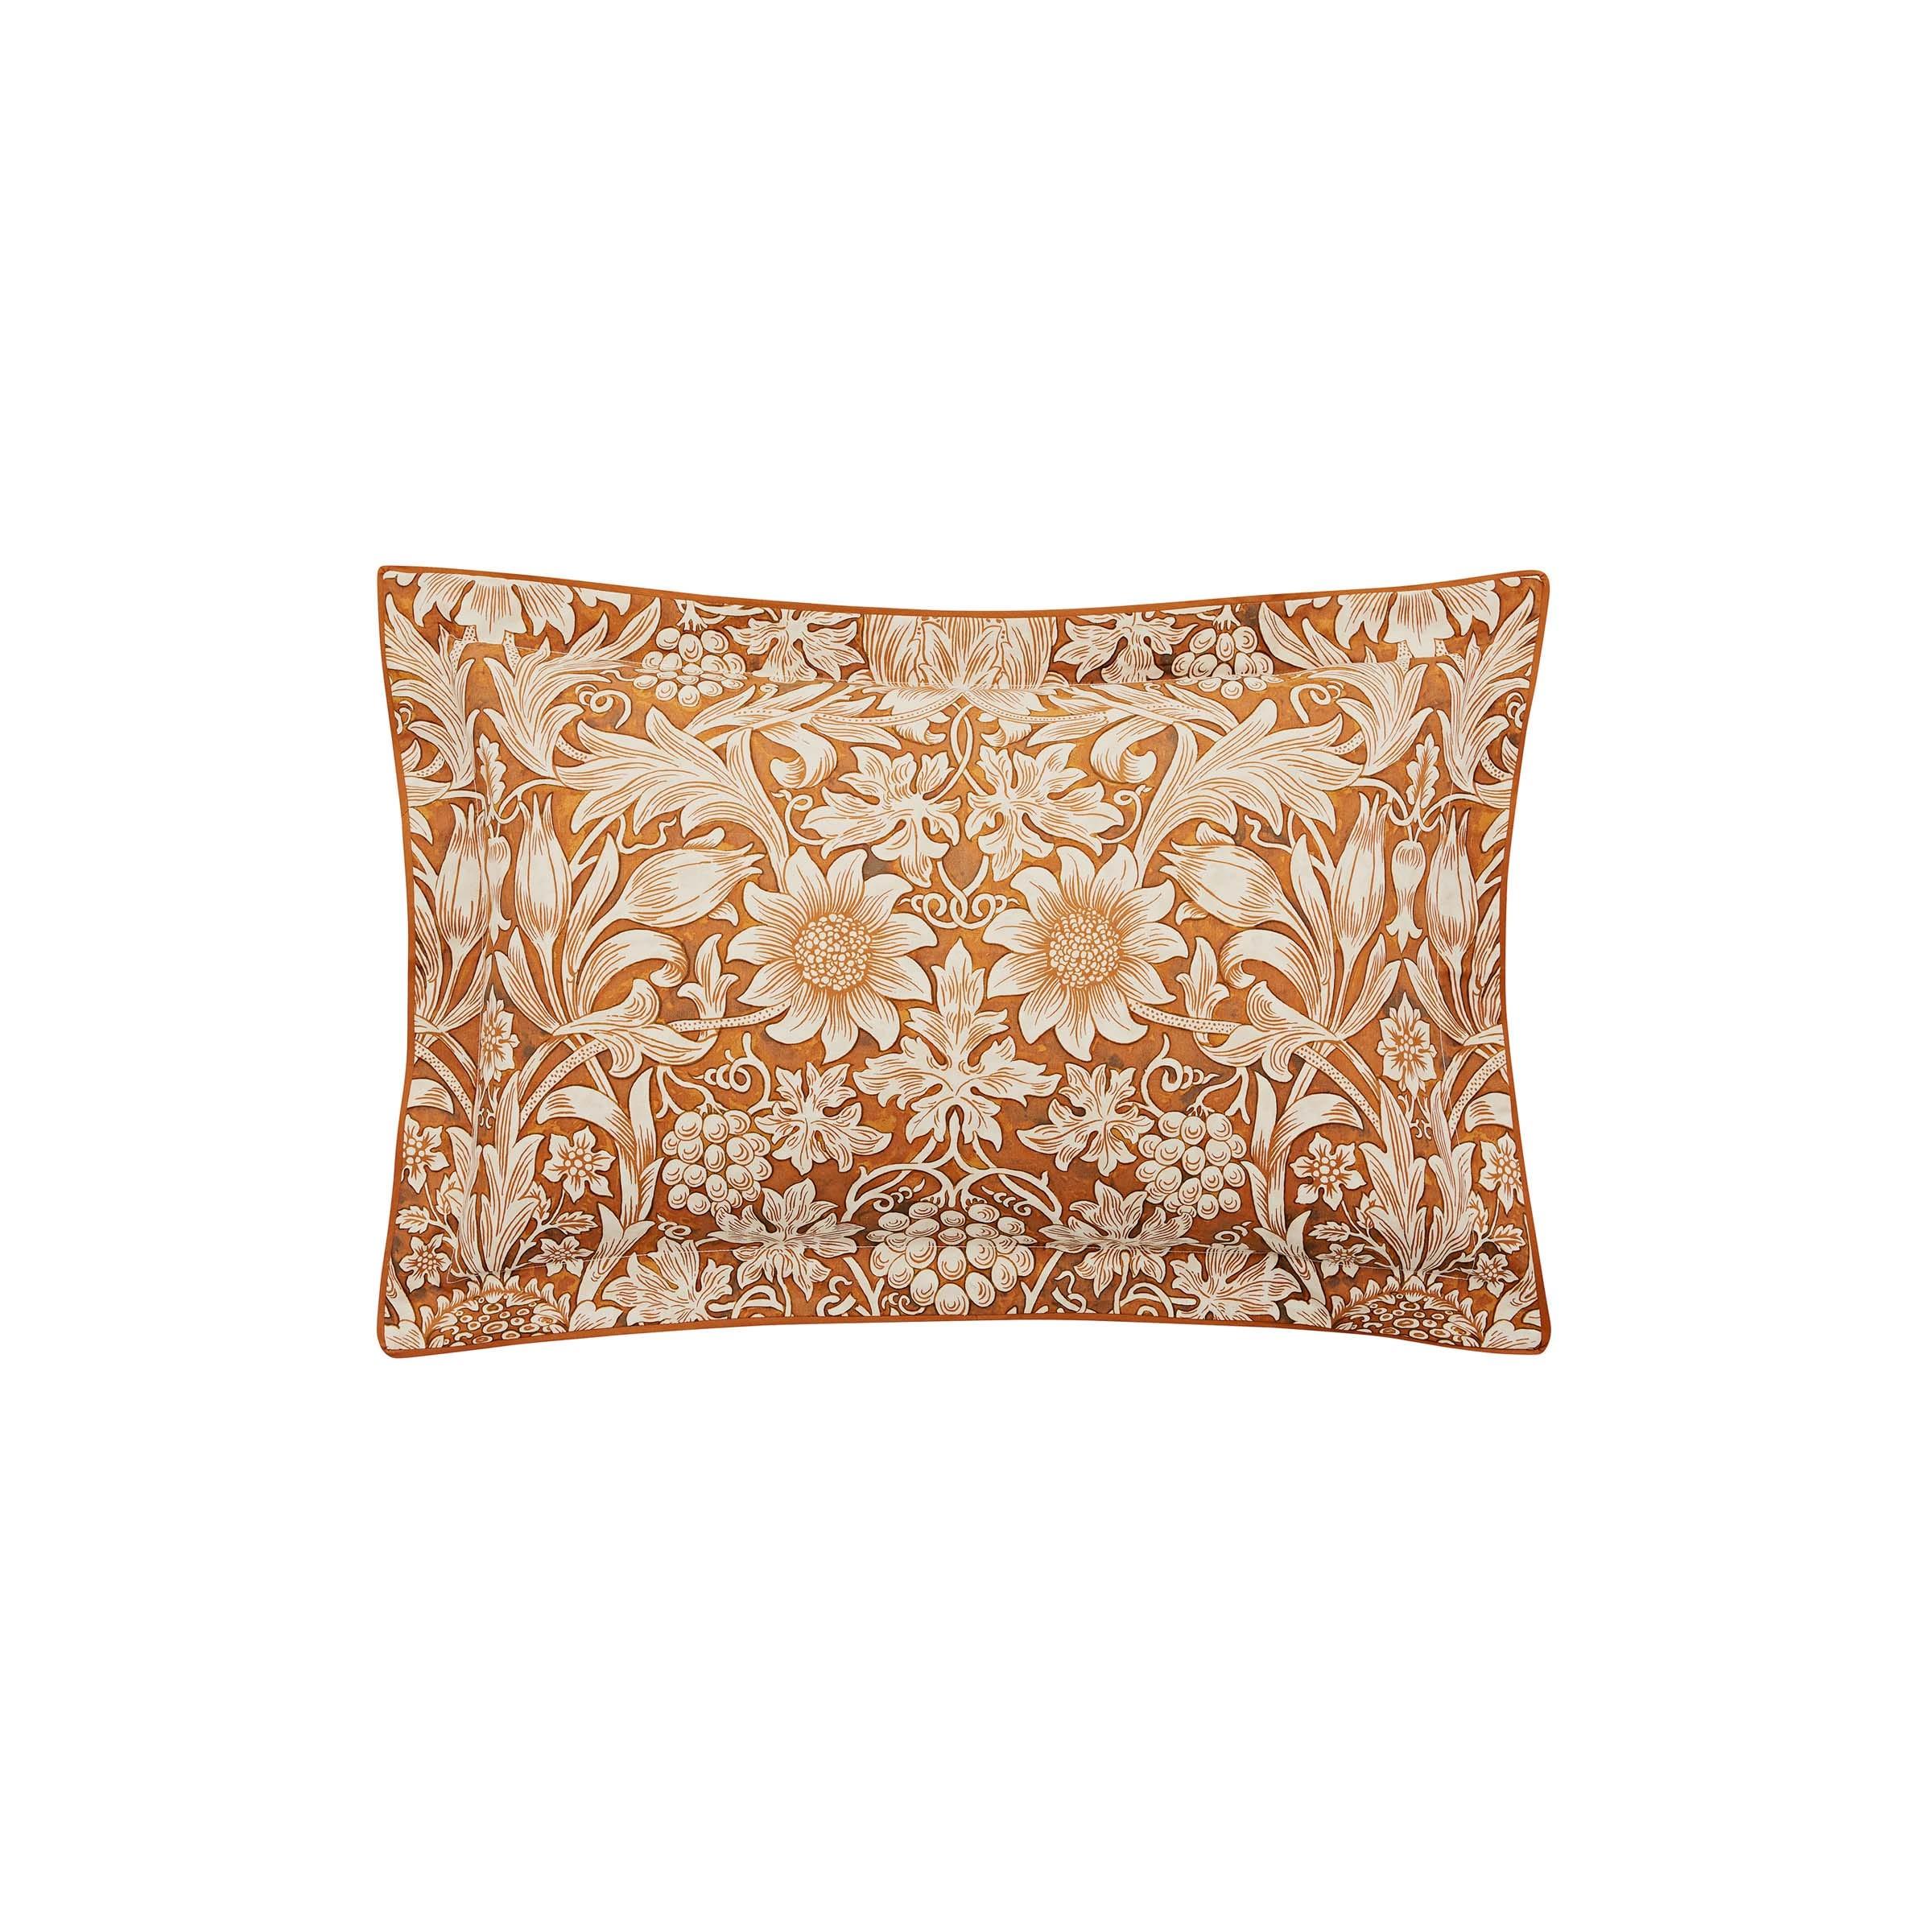 William Morris Sunflower Oxford Pillowcase, Saffron